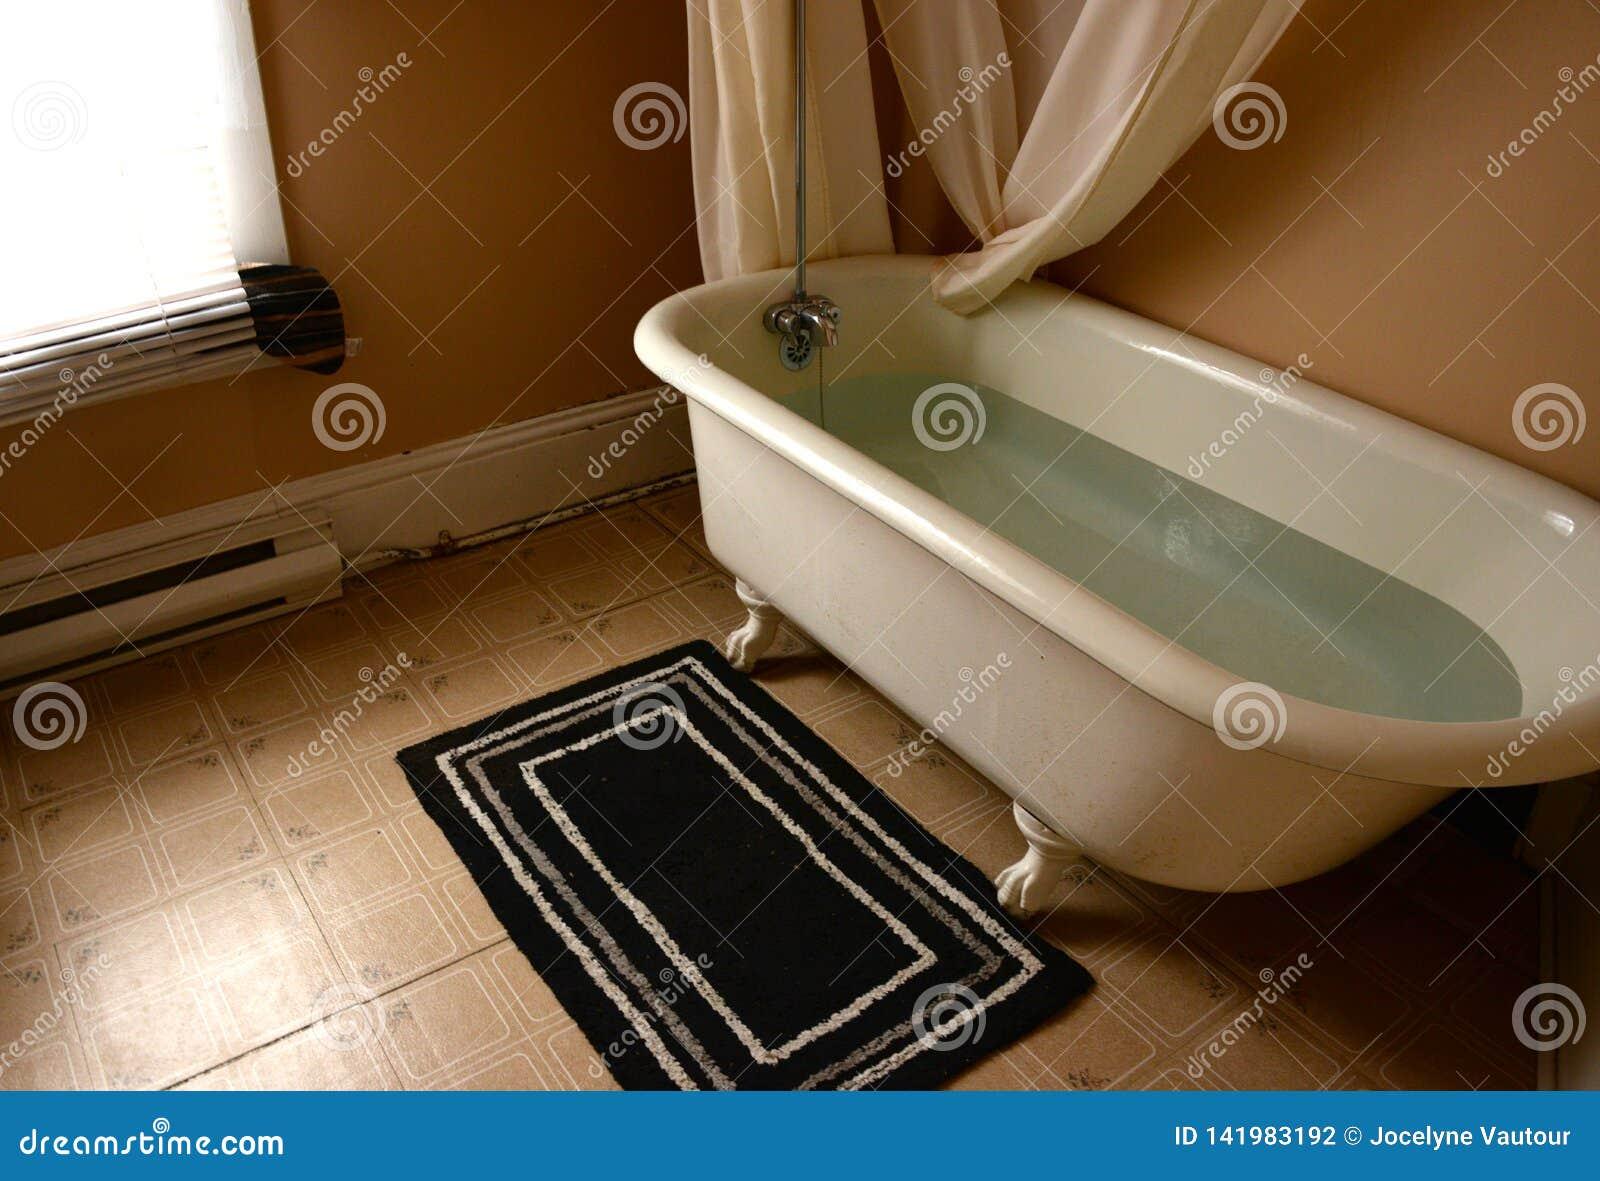 Old claw foot bathtub in old bathroom